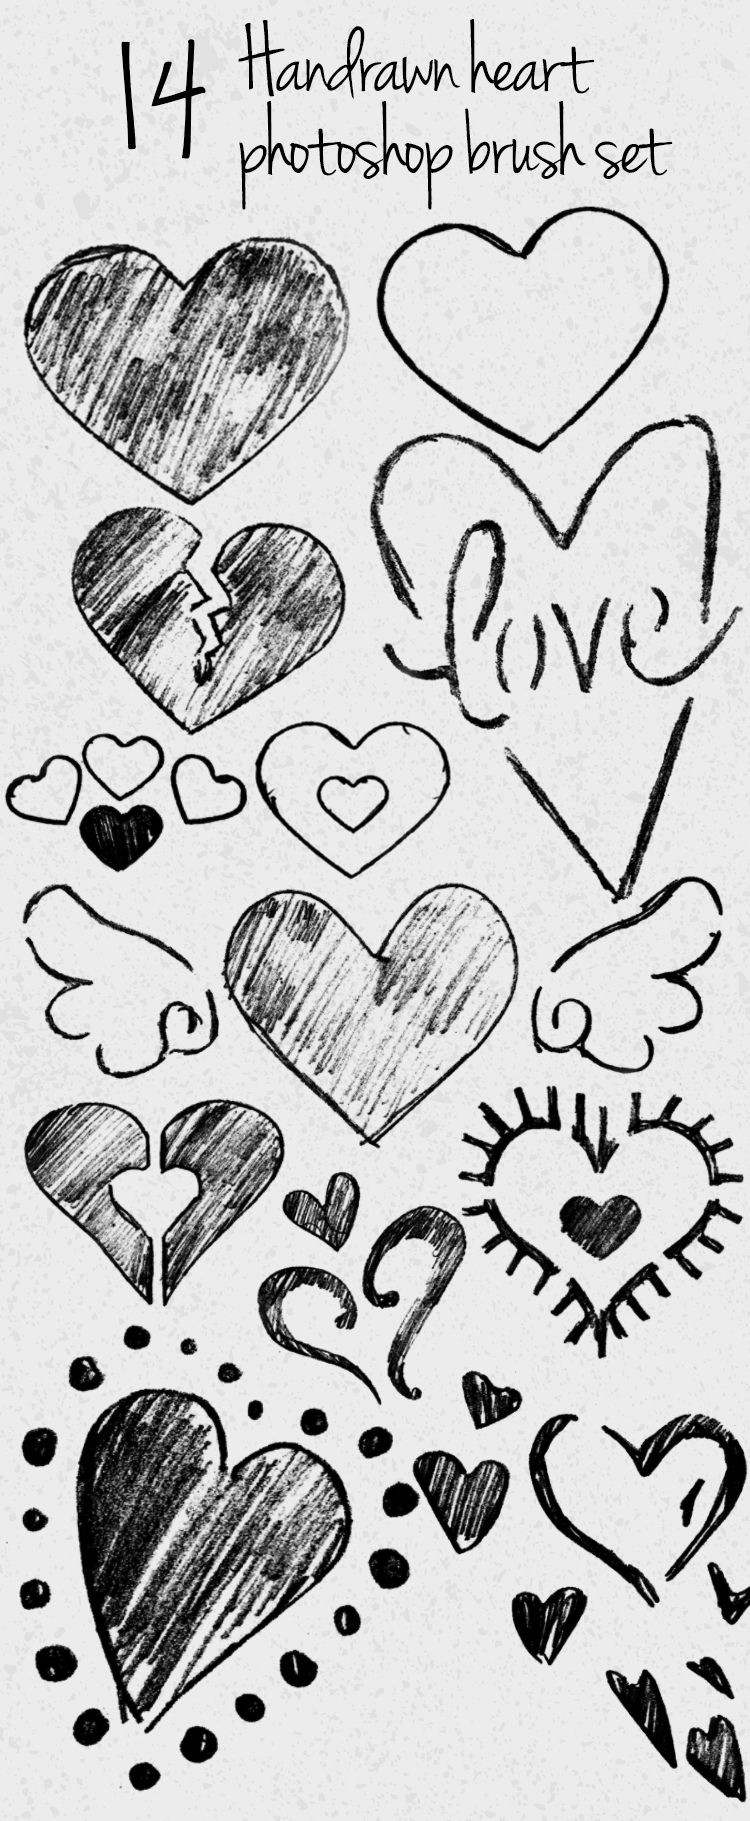 handdrawn heart photoshop brush set 14 hand drawn heart Photoshop brushes